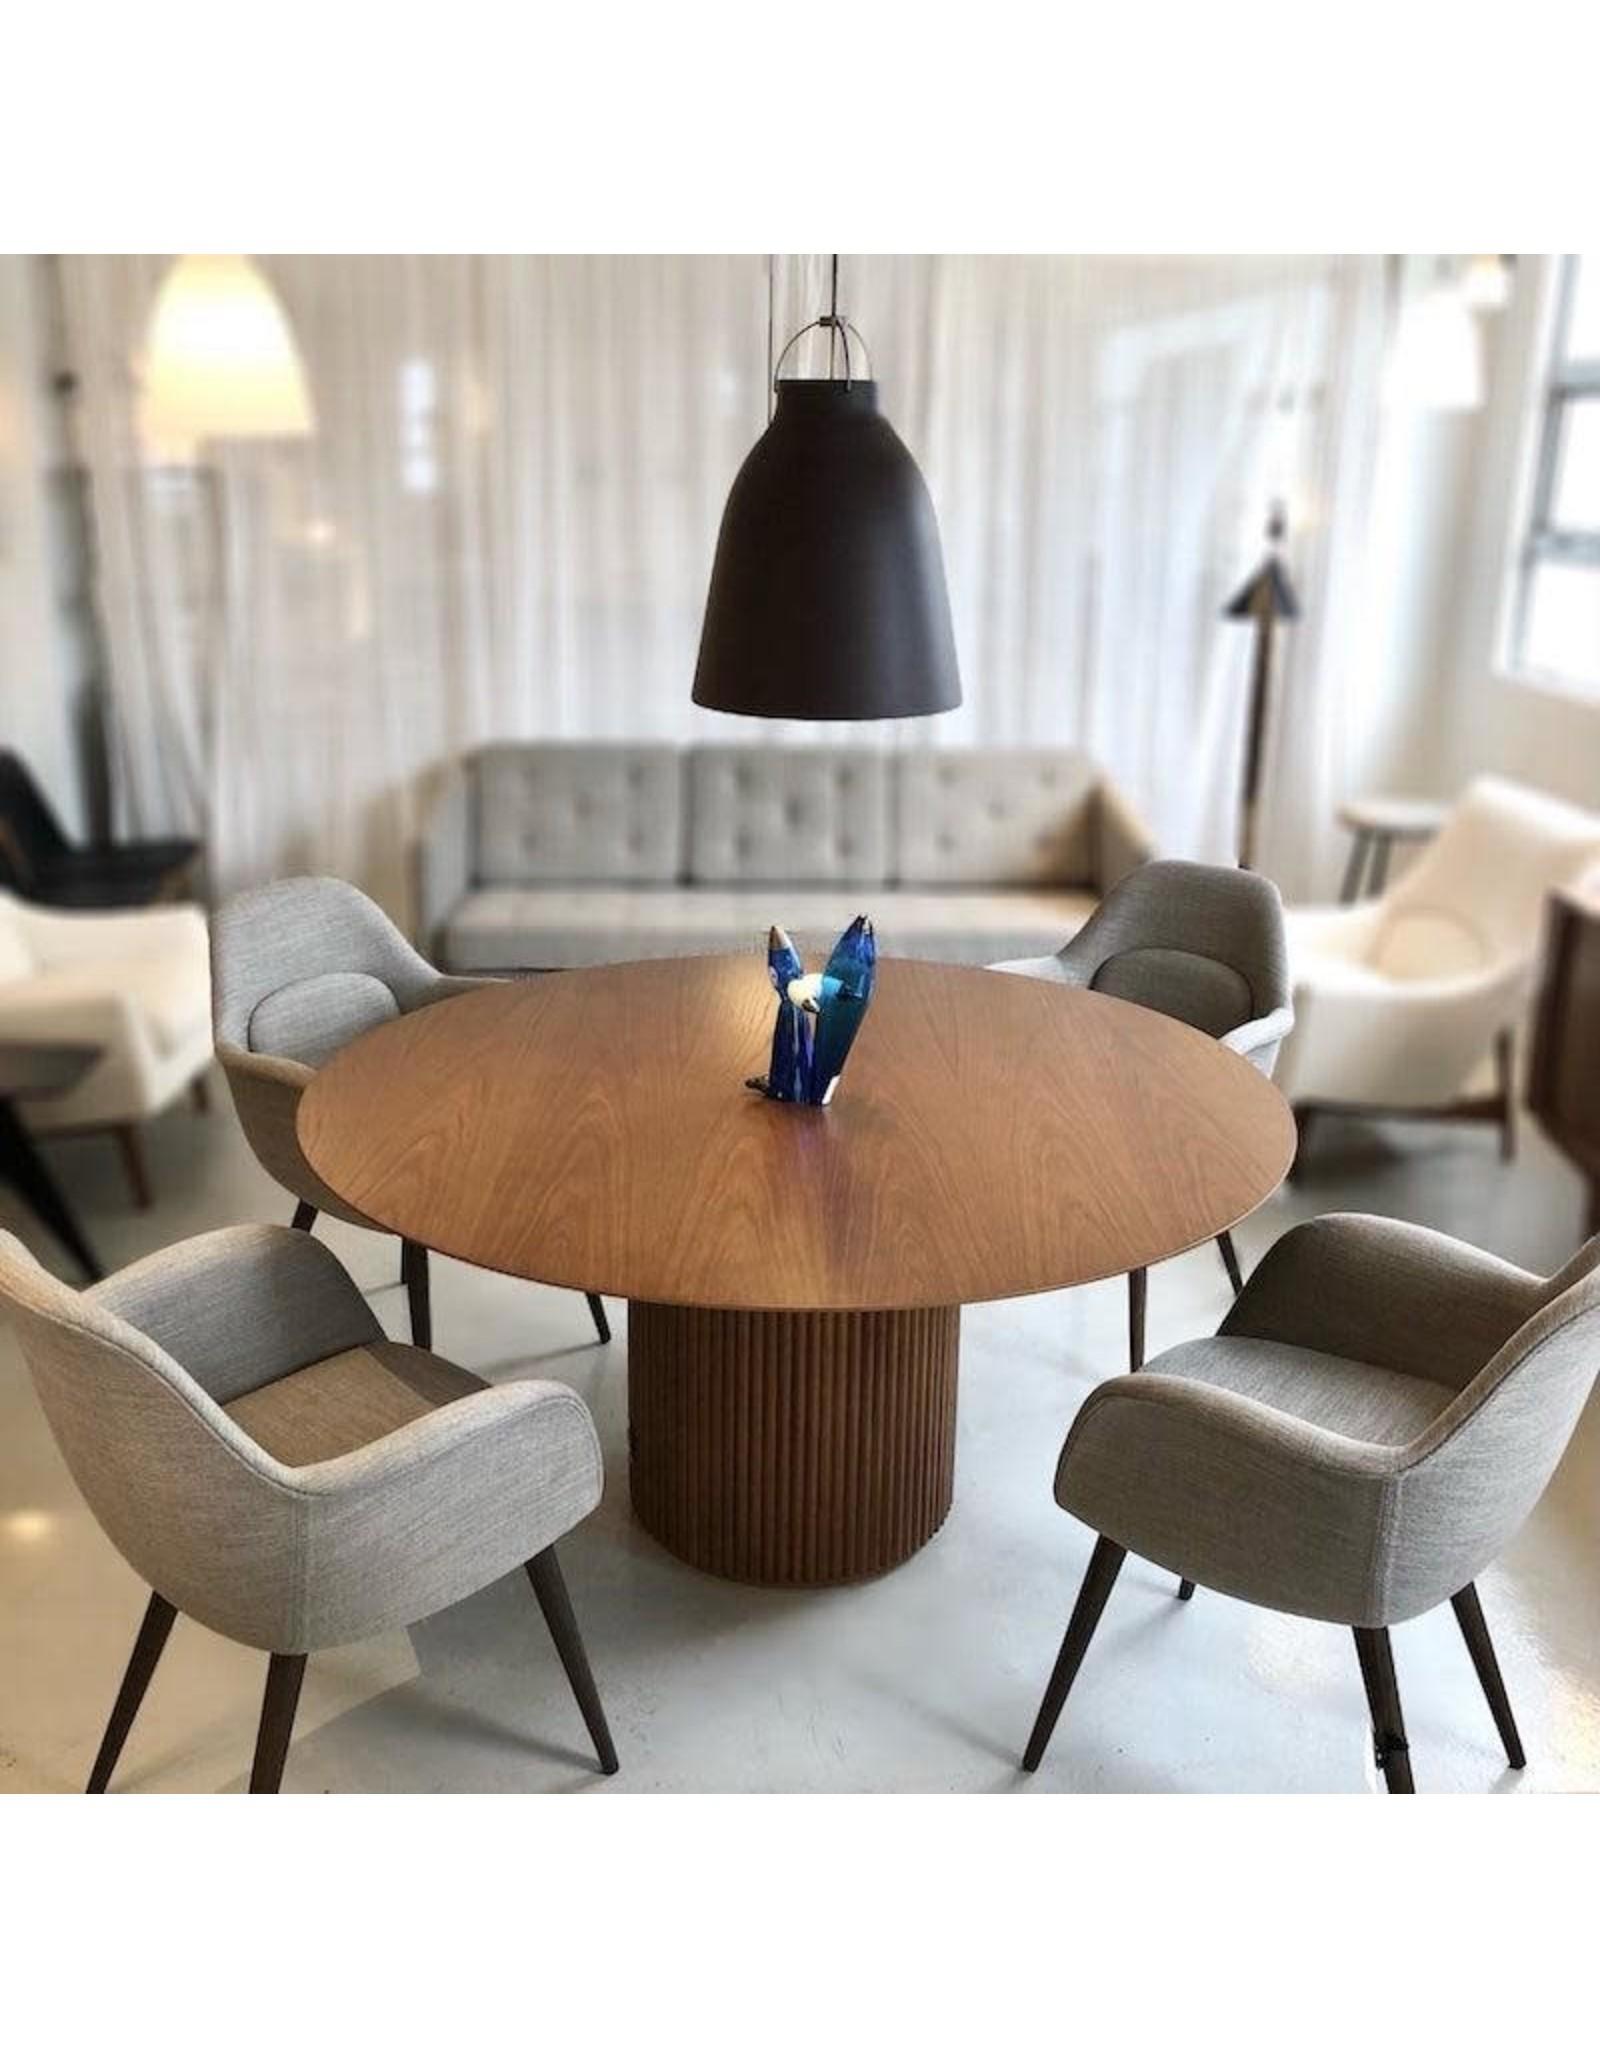 PALAIS ROYAL LARGE ROUND DINING TABLE